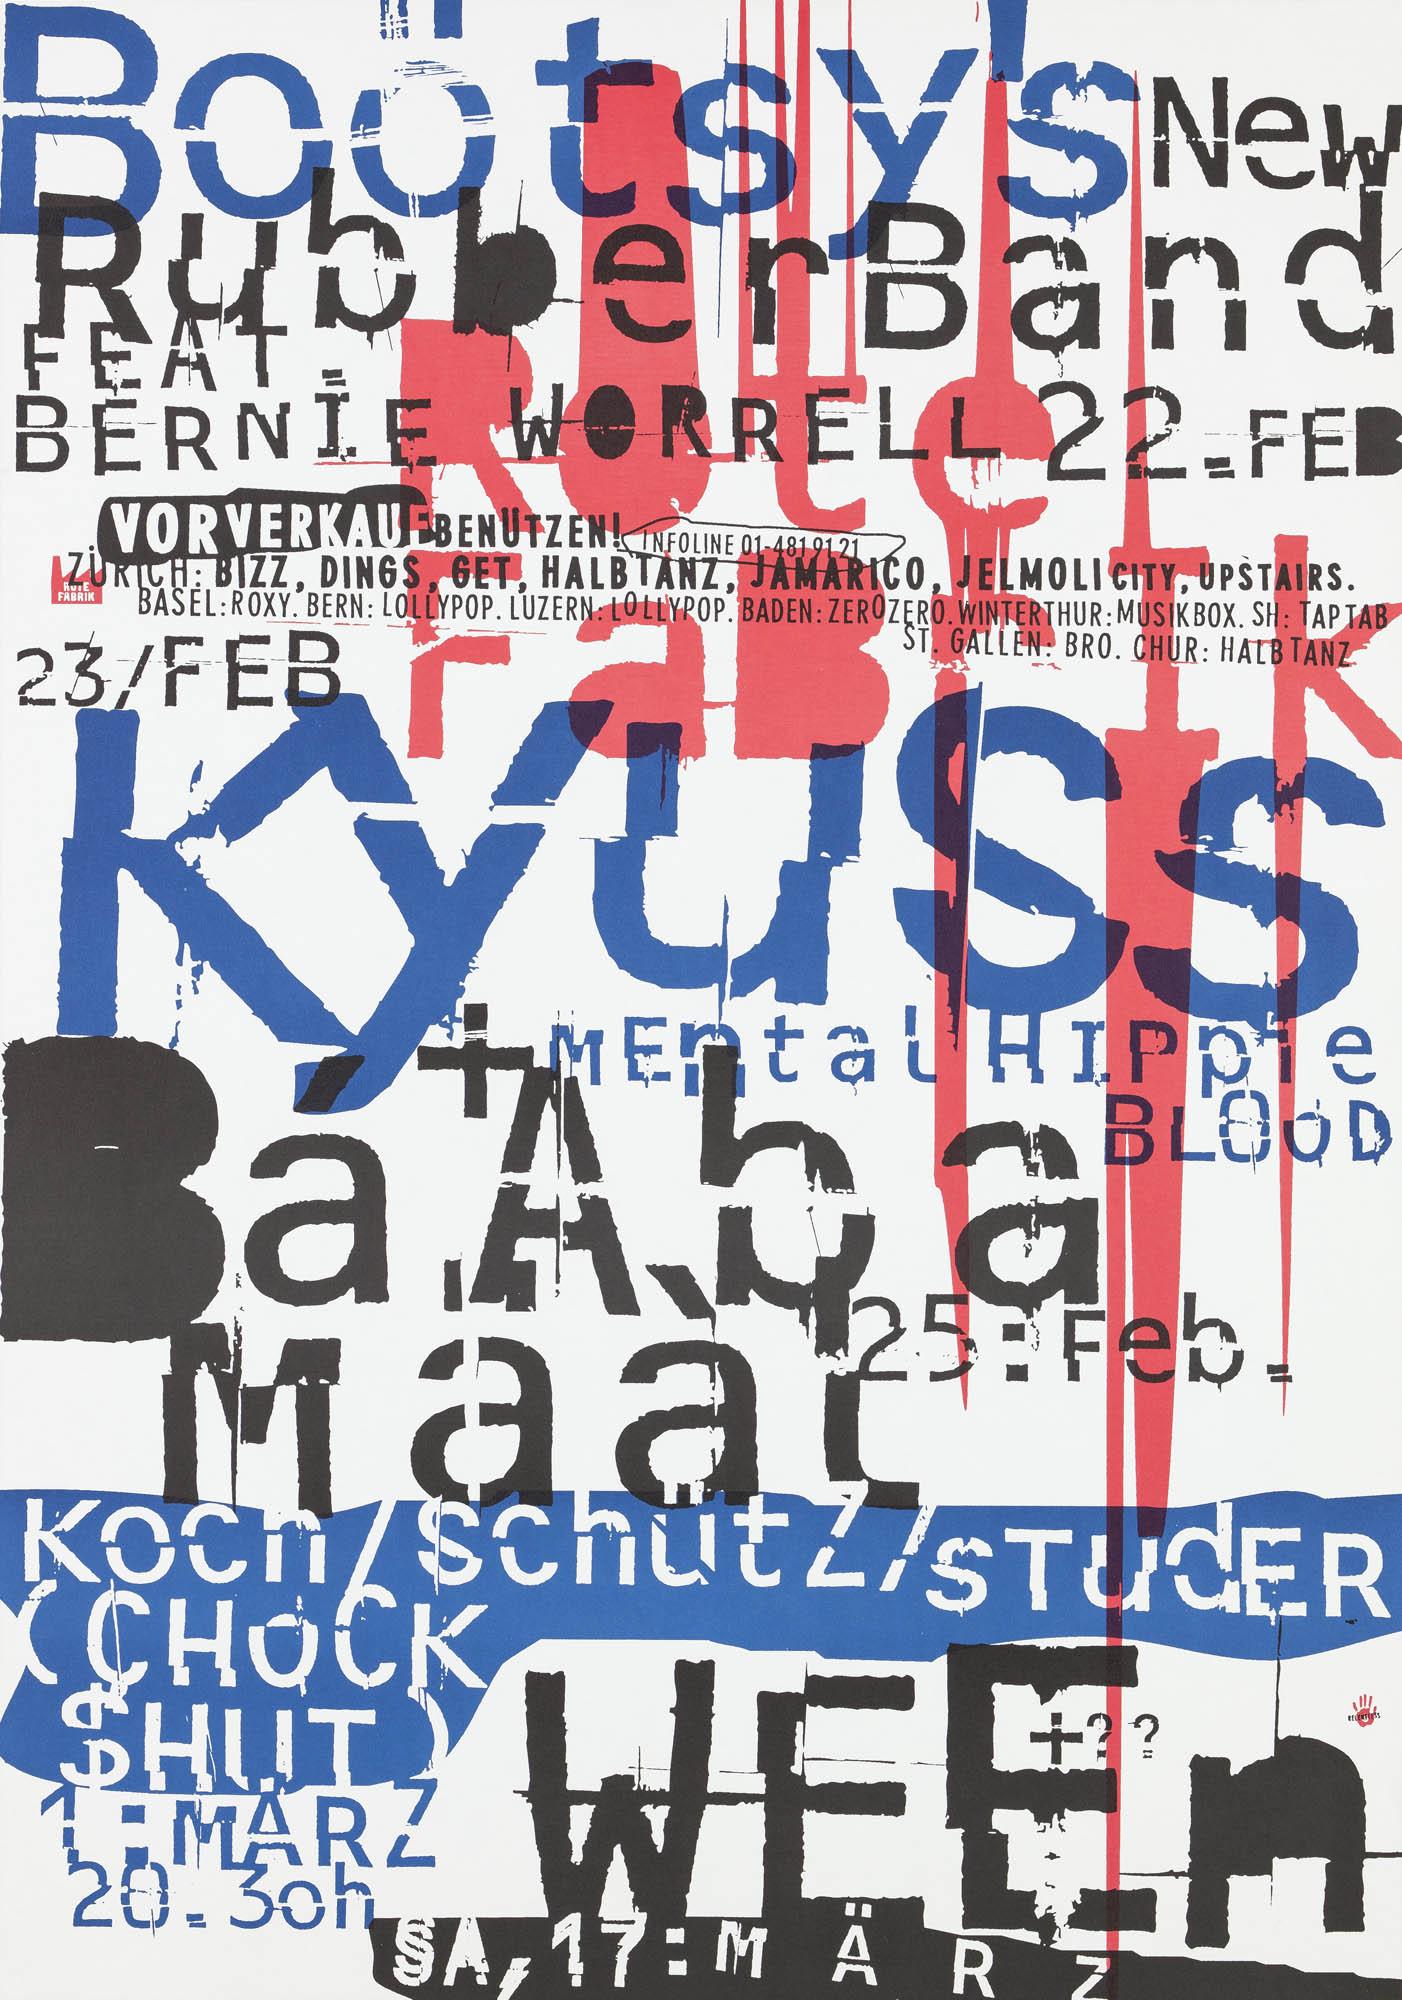 Mai 1994 – Rote Fabrik Cornel Windlin Poster